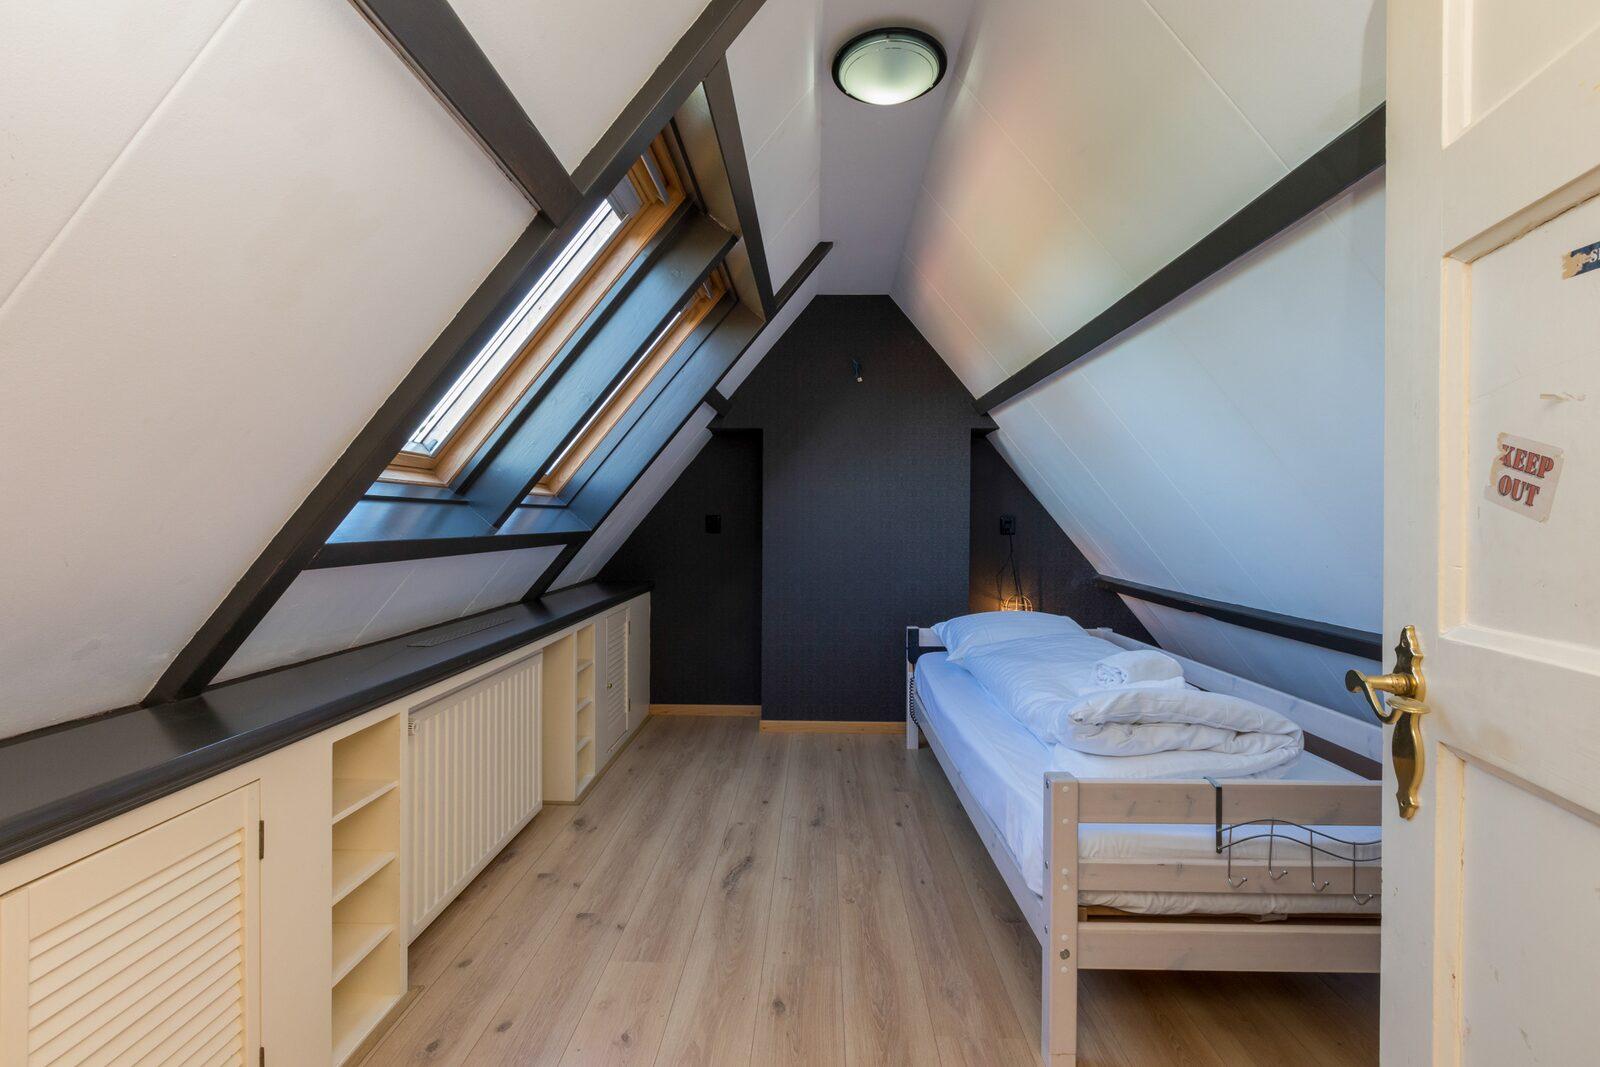 Vakantiewoning - Dorpsstraat 14 | Biggekerke